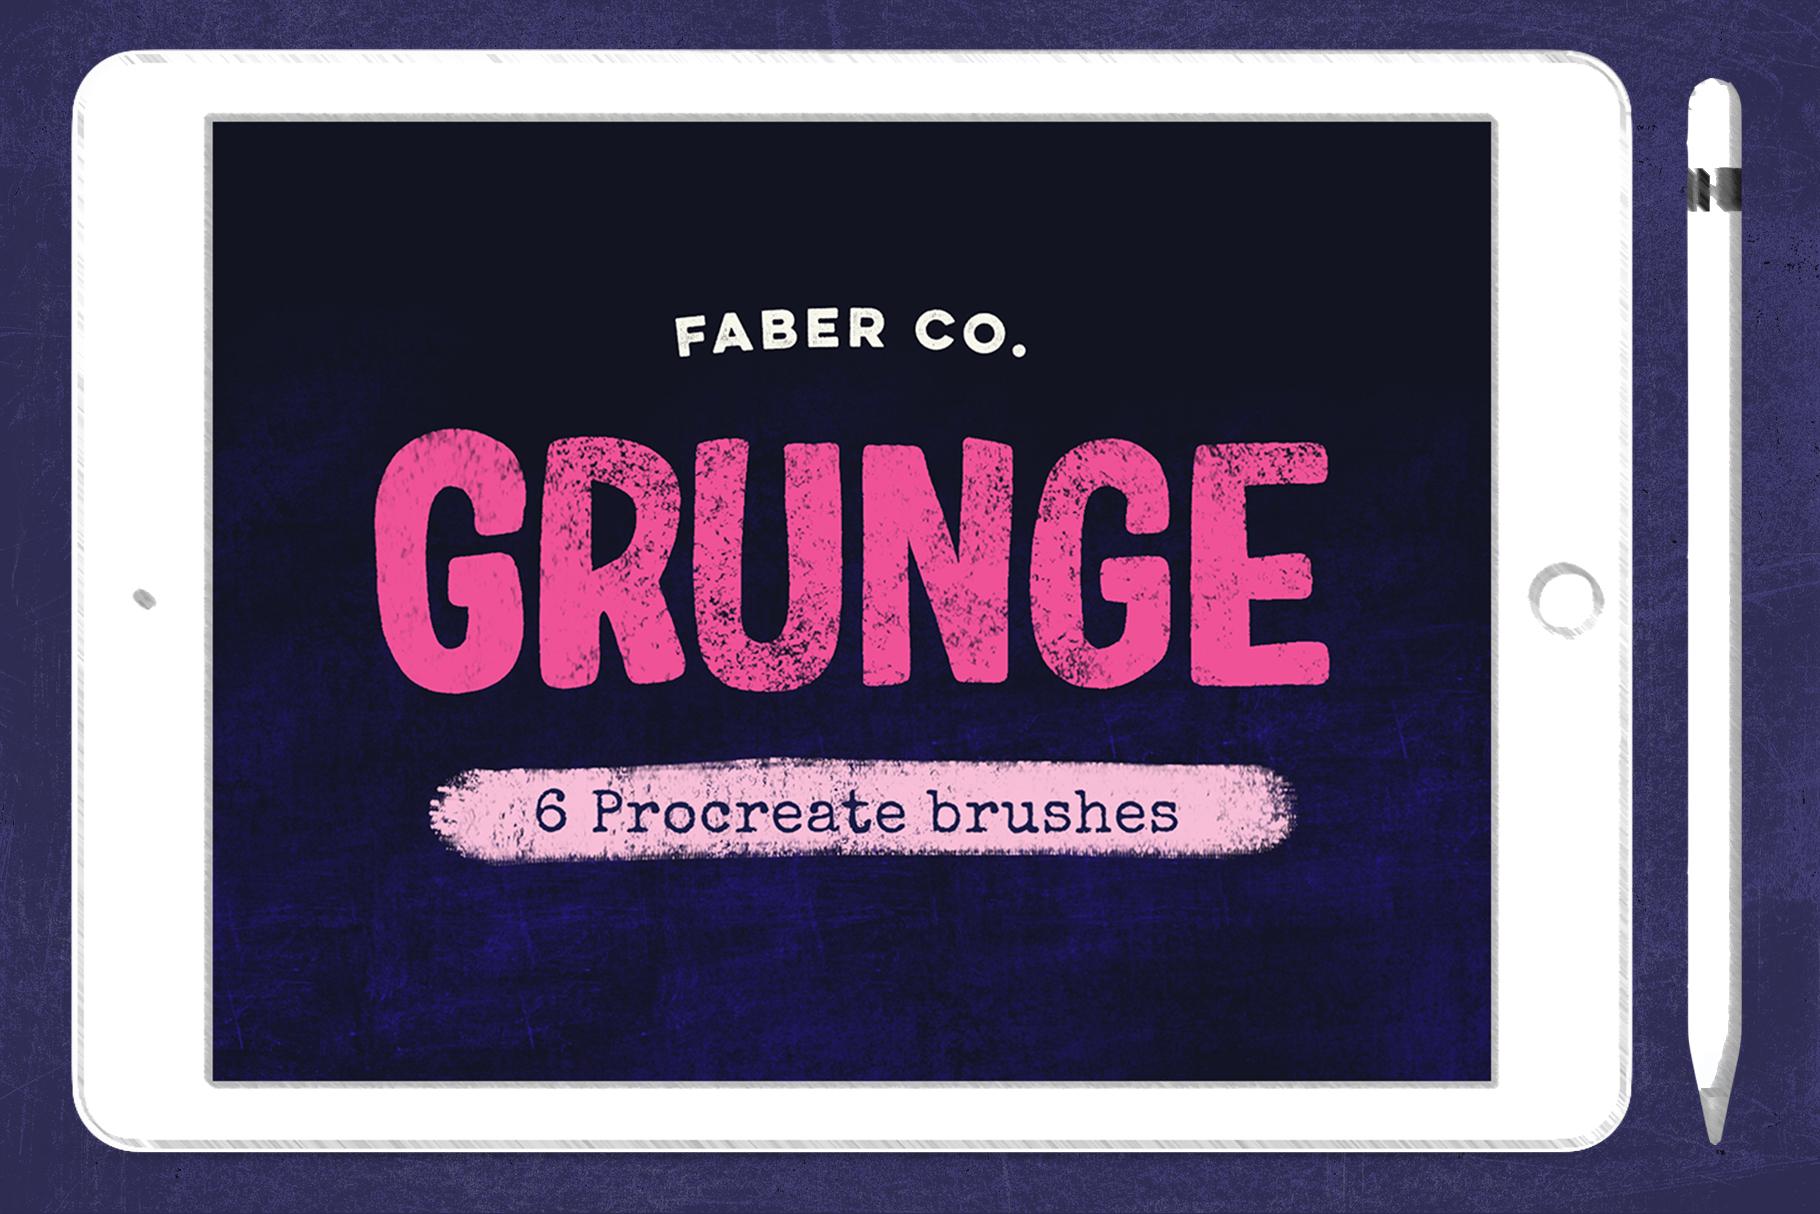 01_grunge-procreate-brushes_cover_no2_FaberCo-1820x1214.jpg